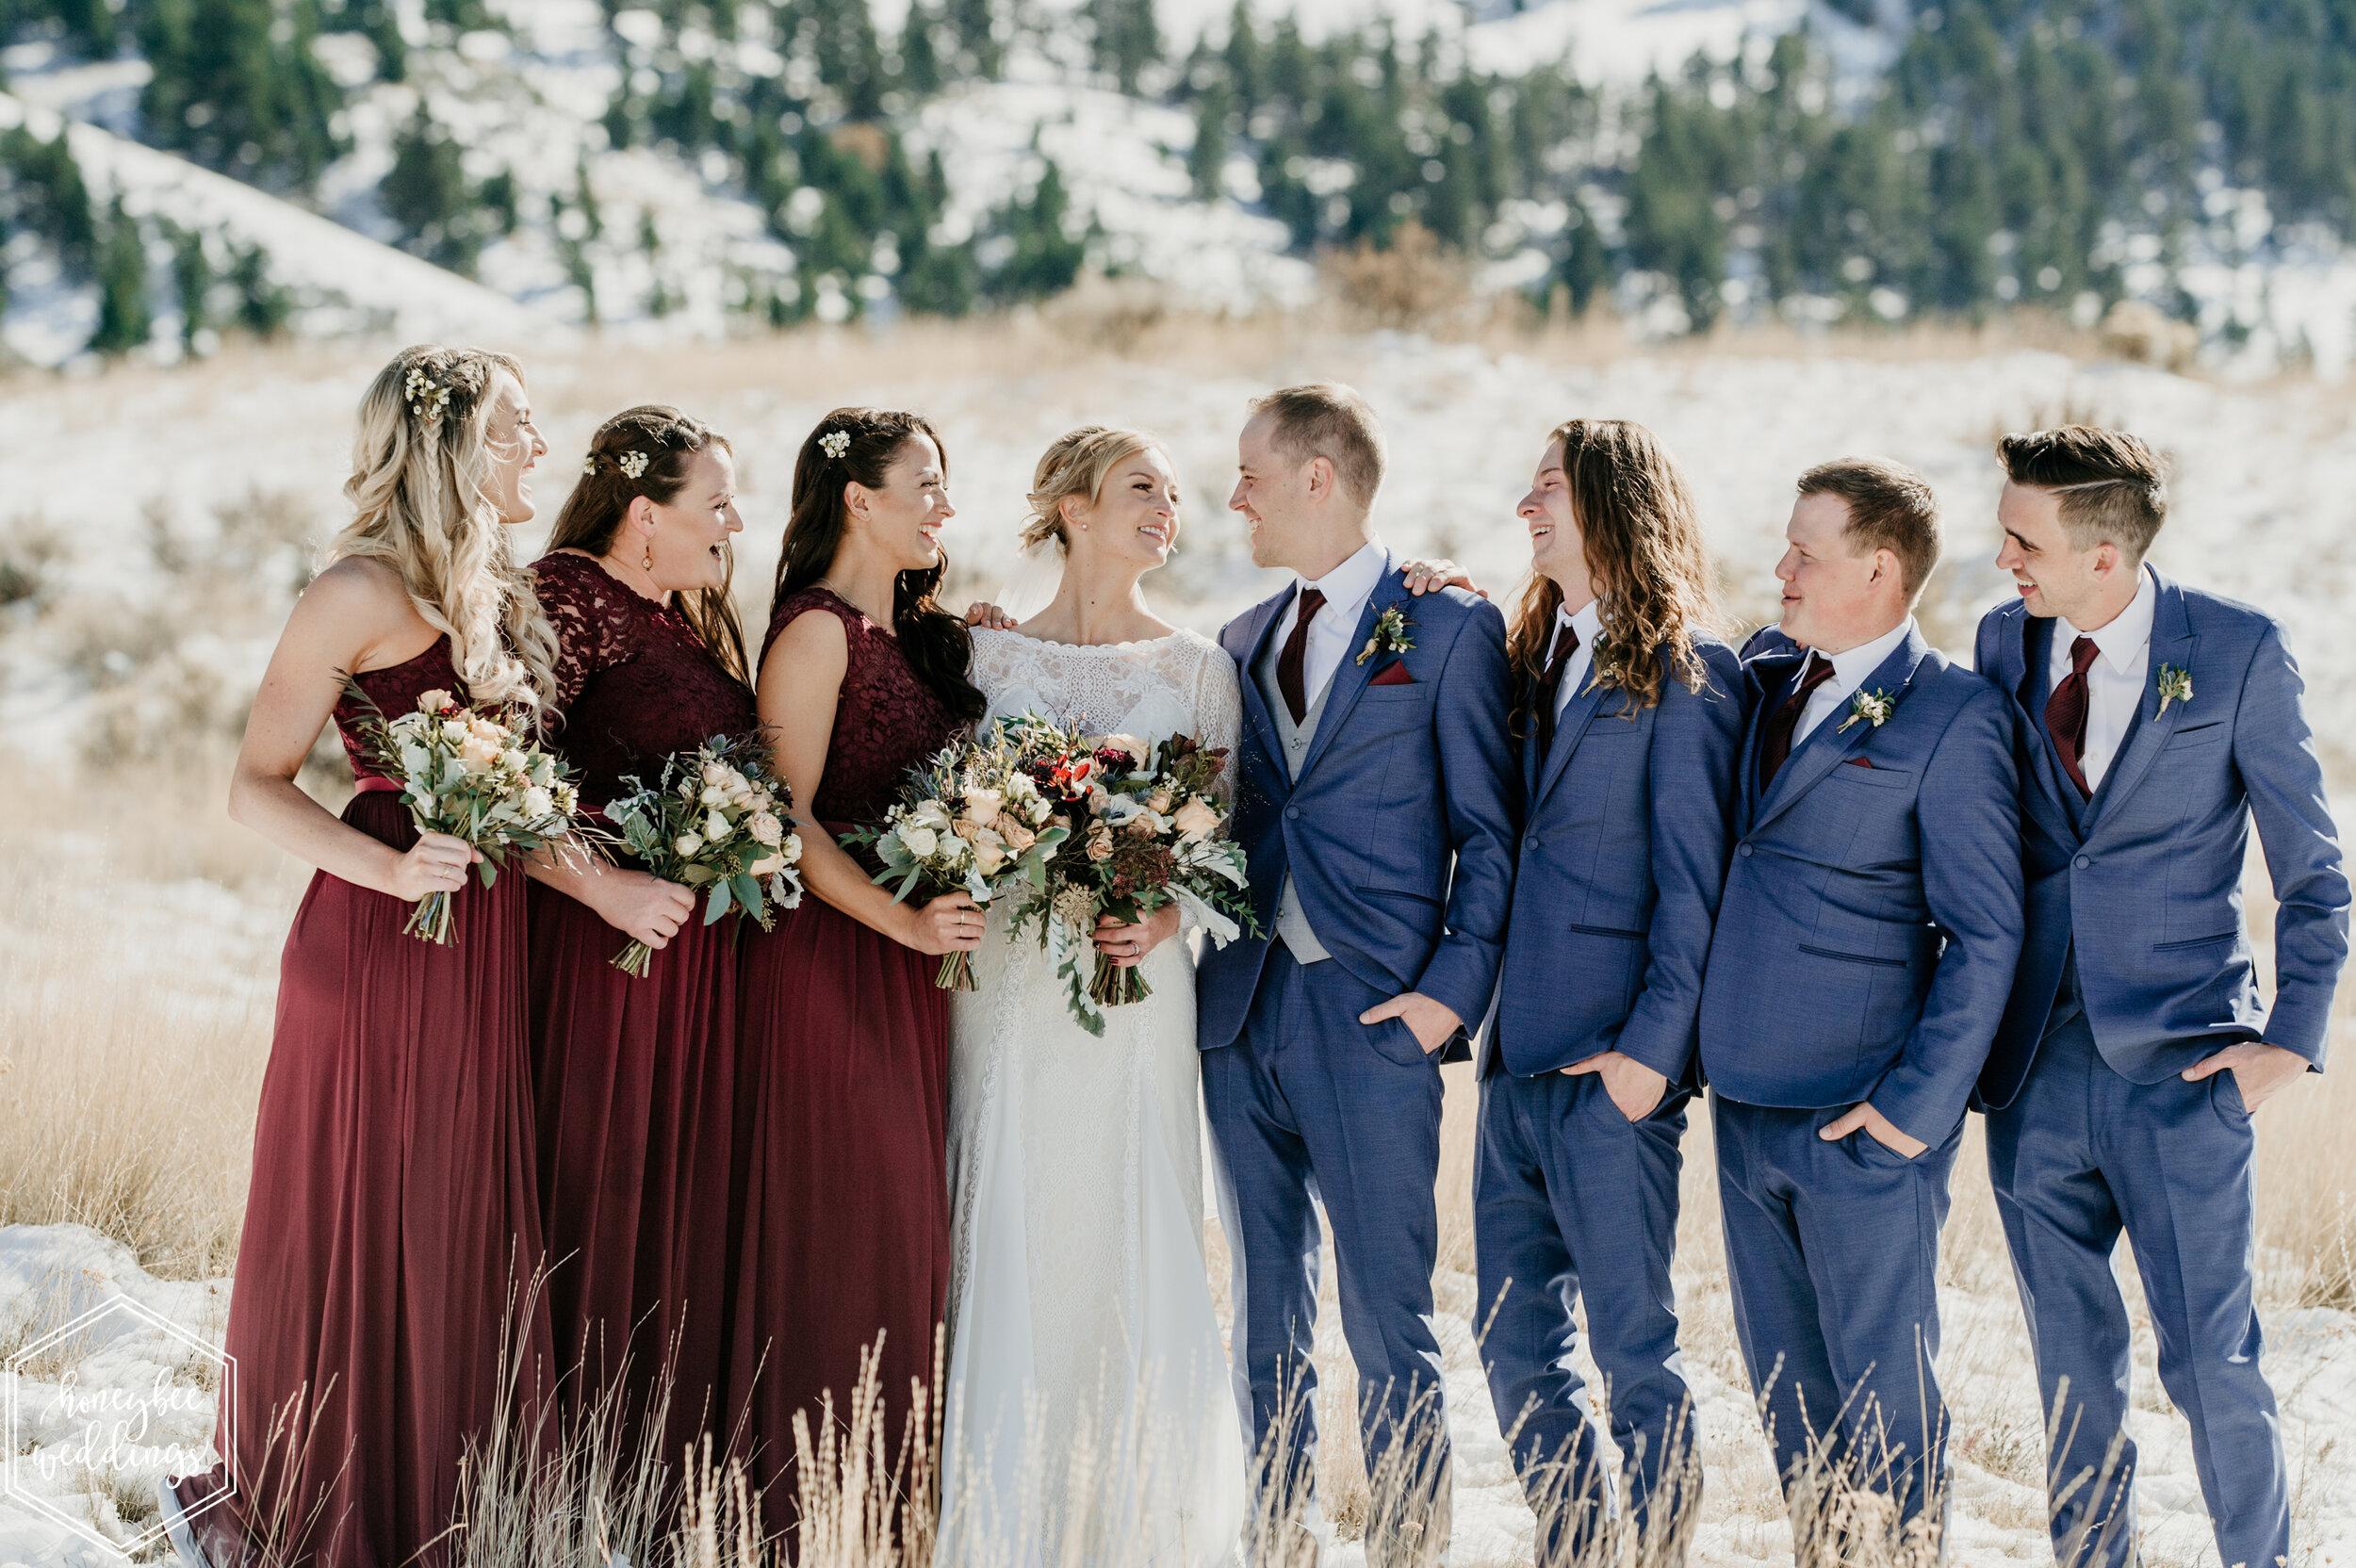 108Chico Hot Springs Wedding_Montana Wedding Photographer_Winter Wedding_Ariel & Richard_October 12, 2019-210.jpg